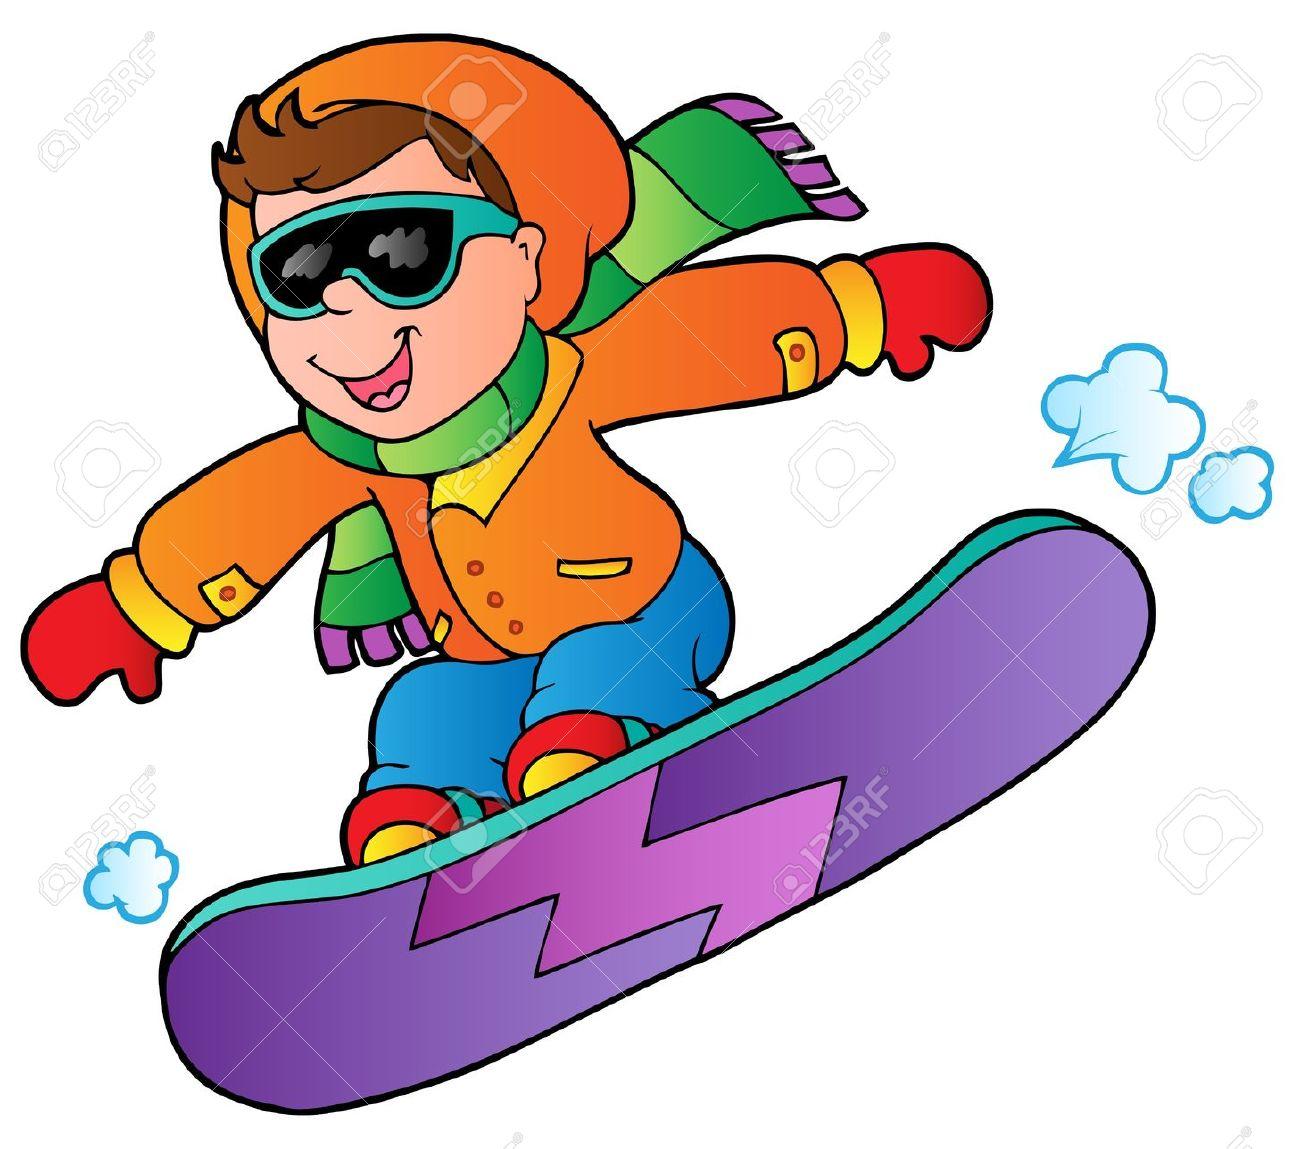 Snowboarding clipart Clipart Clipart Snowboarding Savoronmorehead Savoronmorehead